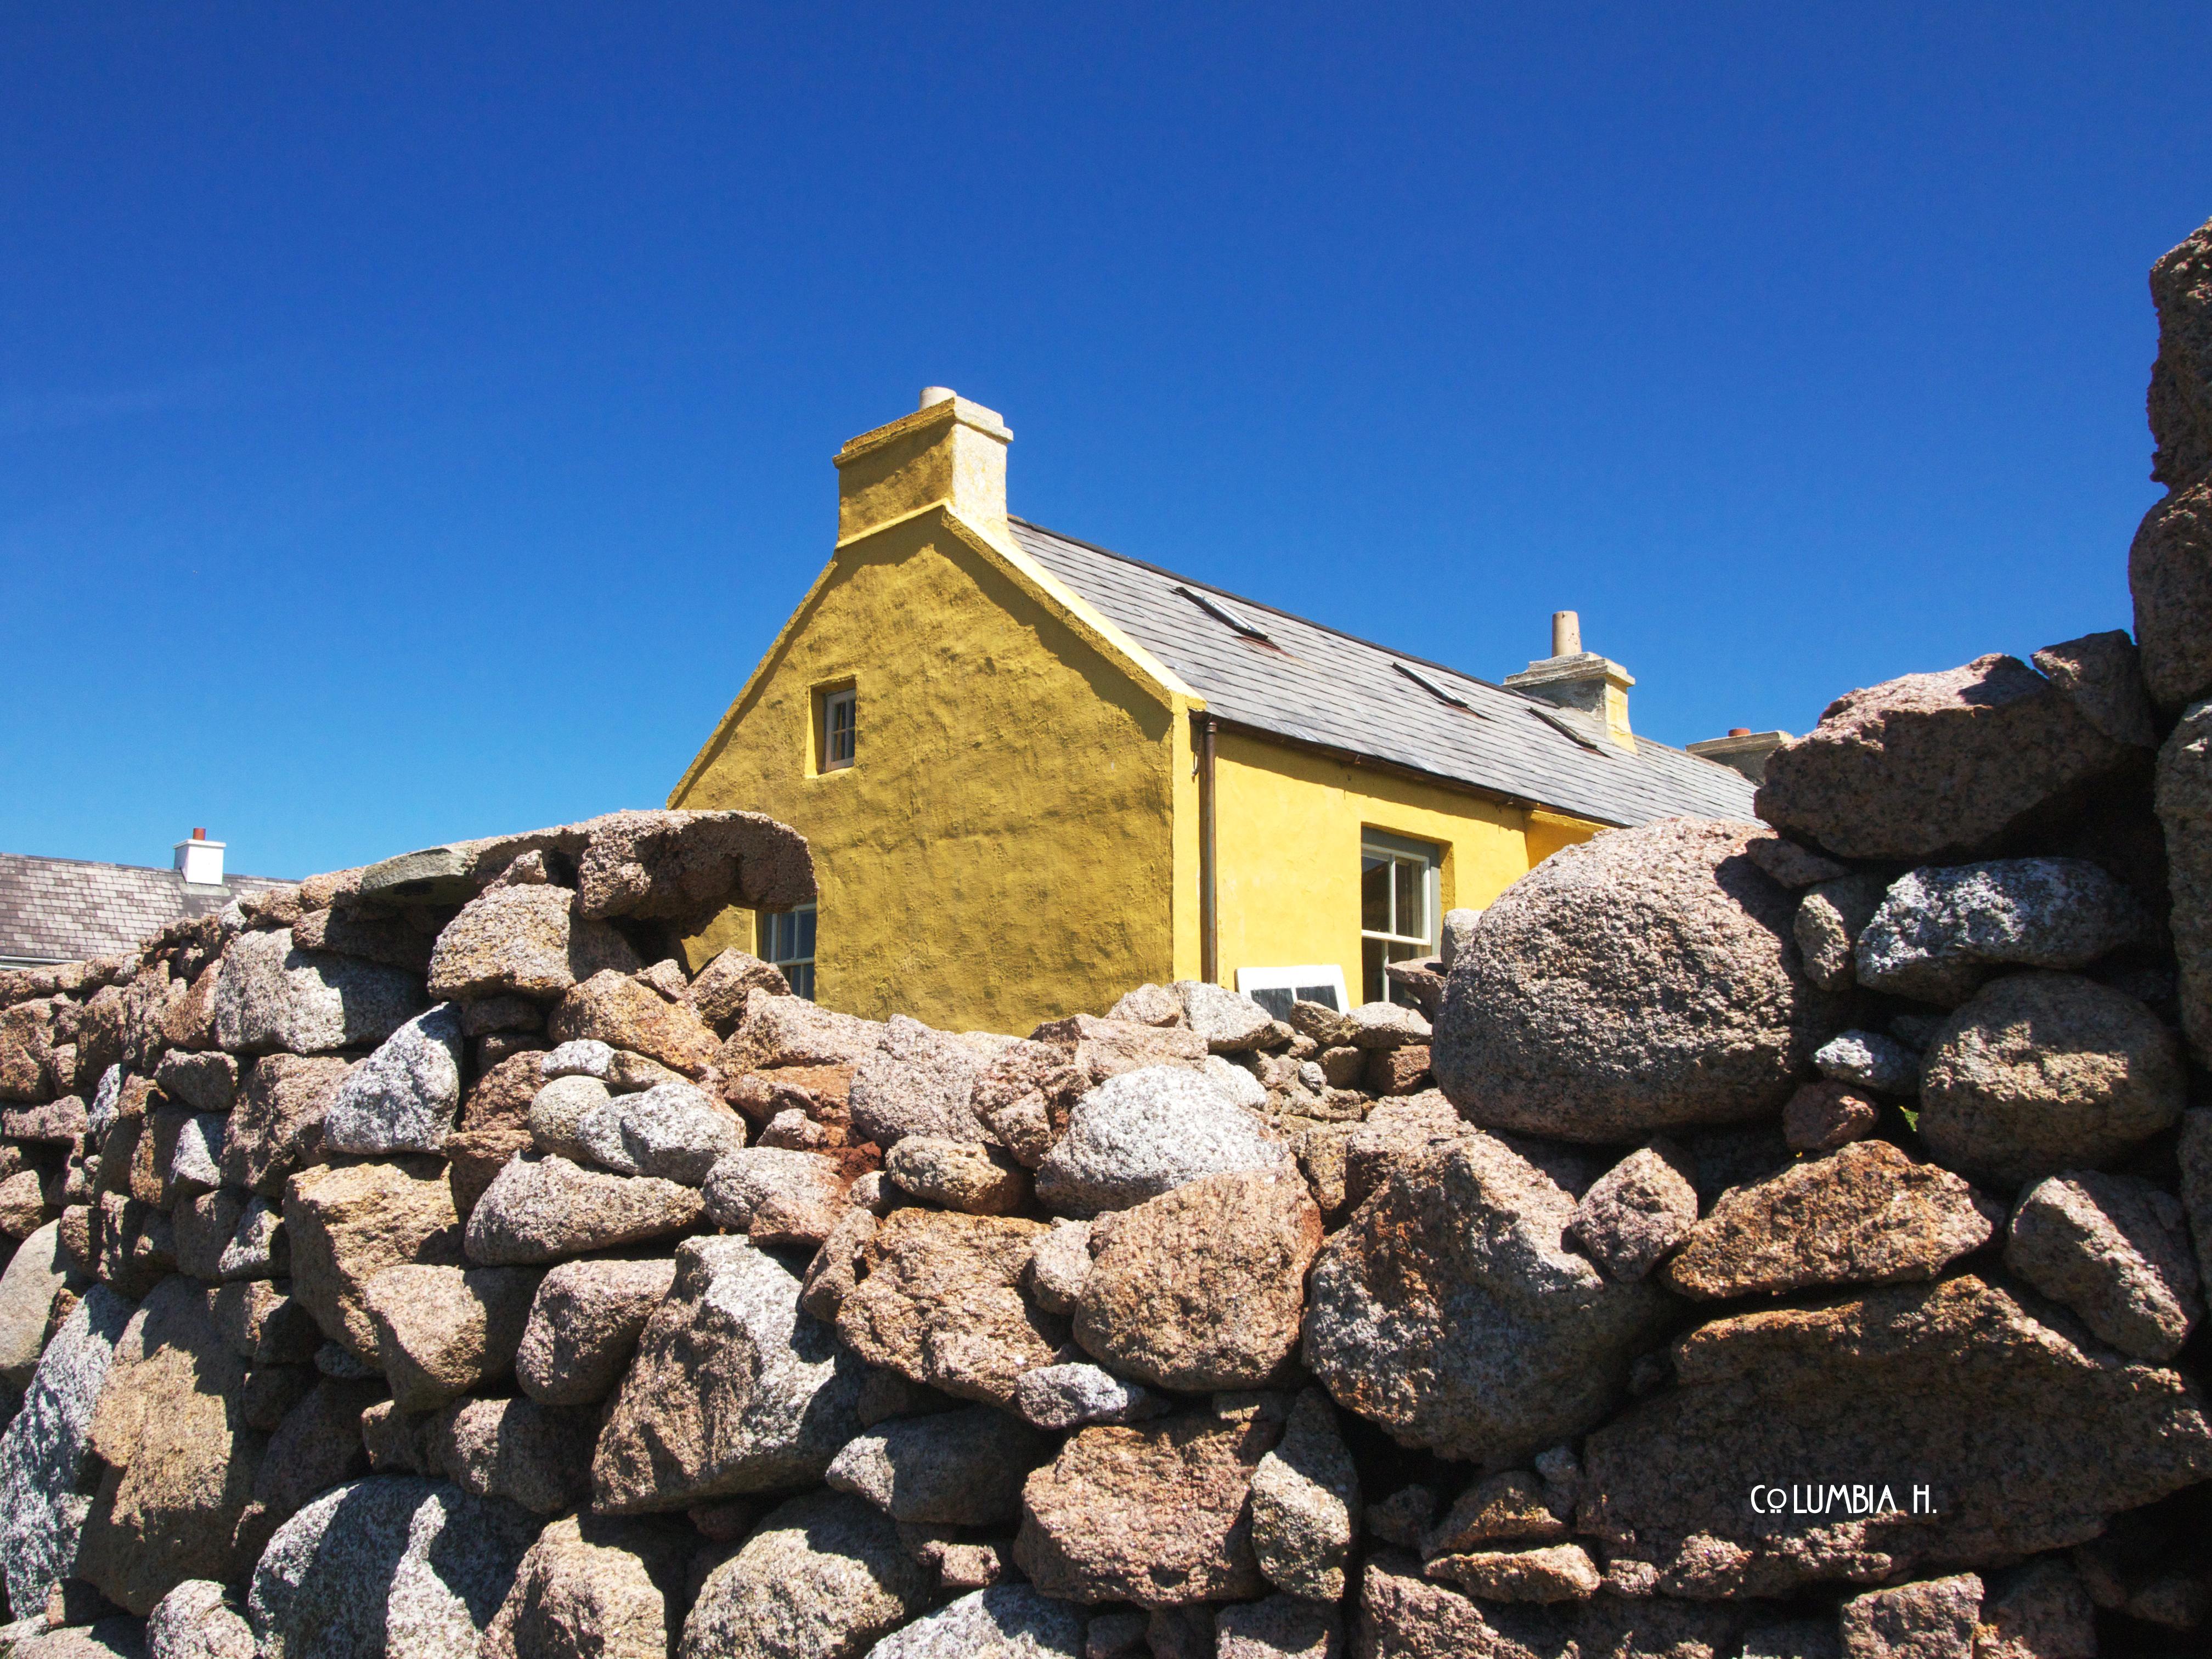 Gola Island, Ireland